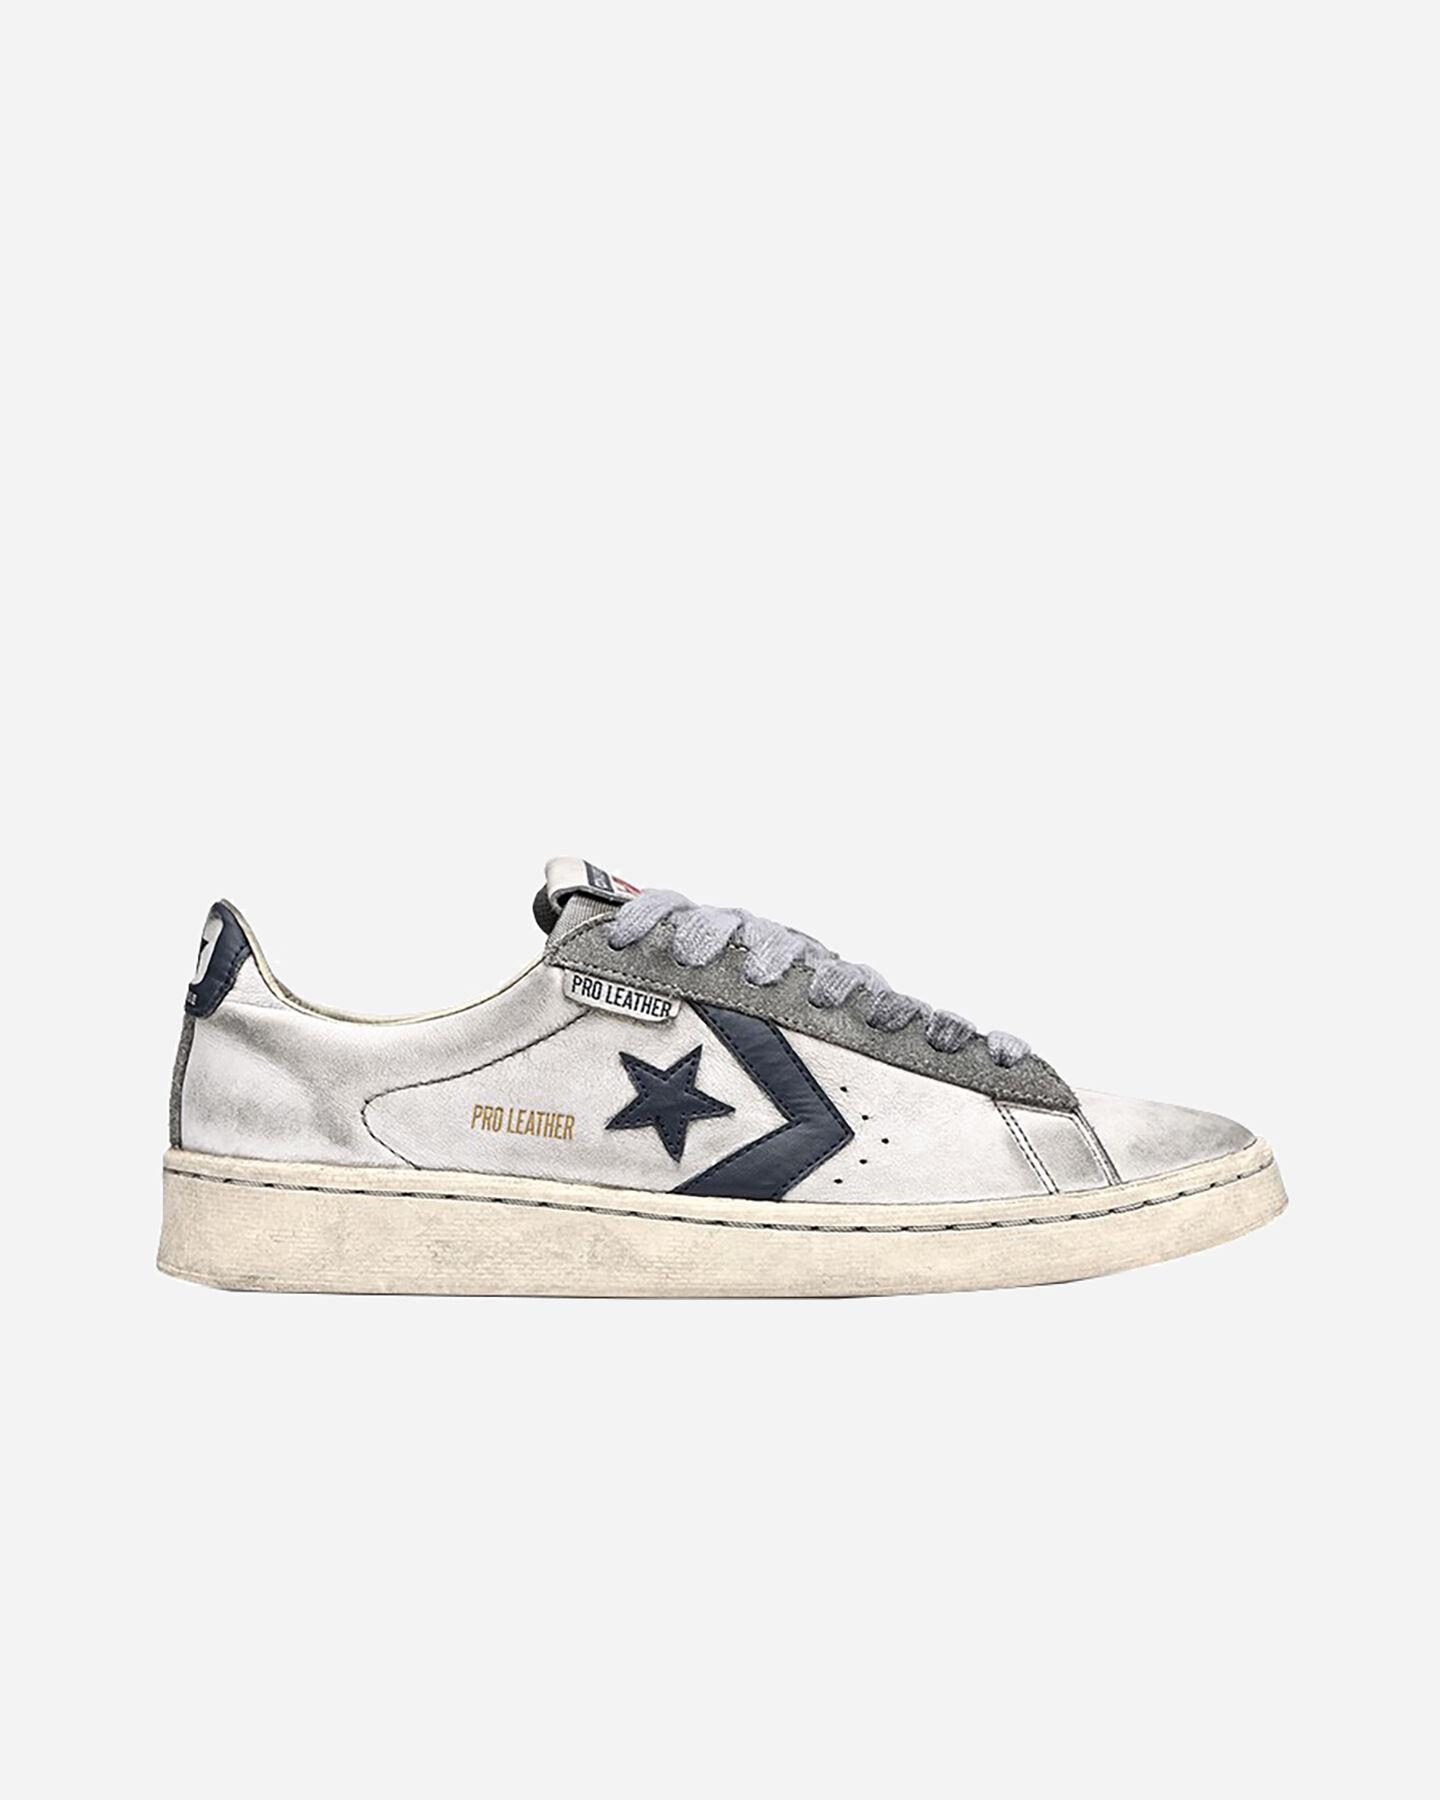 Scarpe sneakers CONVERSE PRO LEATHER OG LTD M S5238003 scatto 0